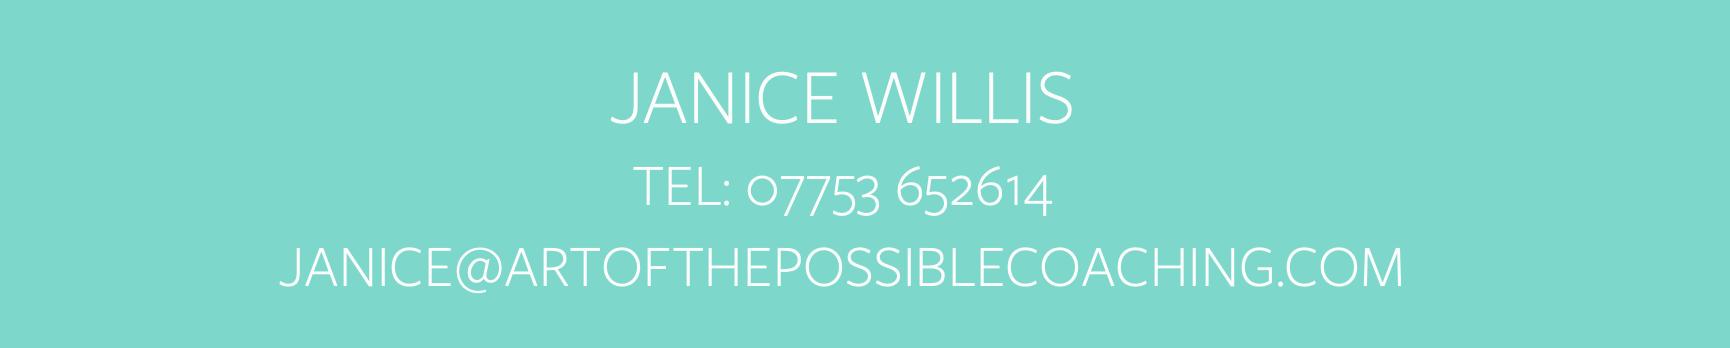 Contact Janice Willis